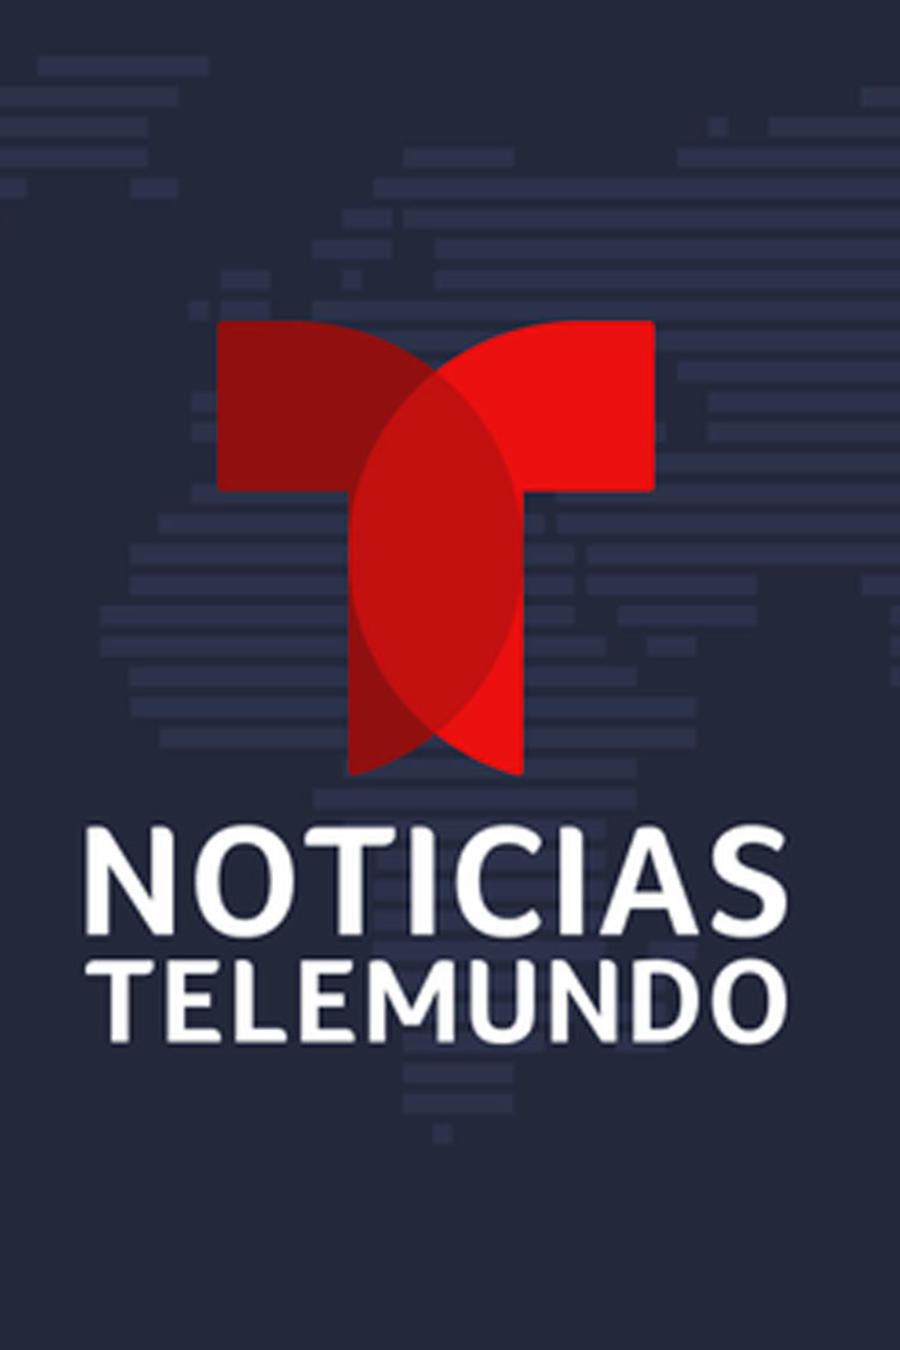 Logo de Noticias Telemundo